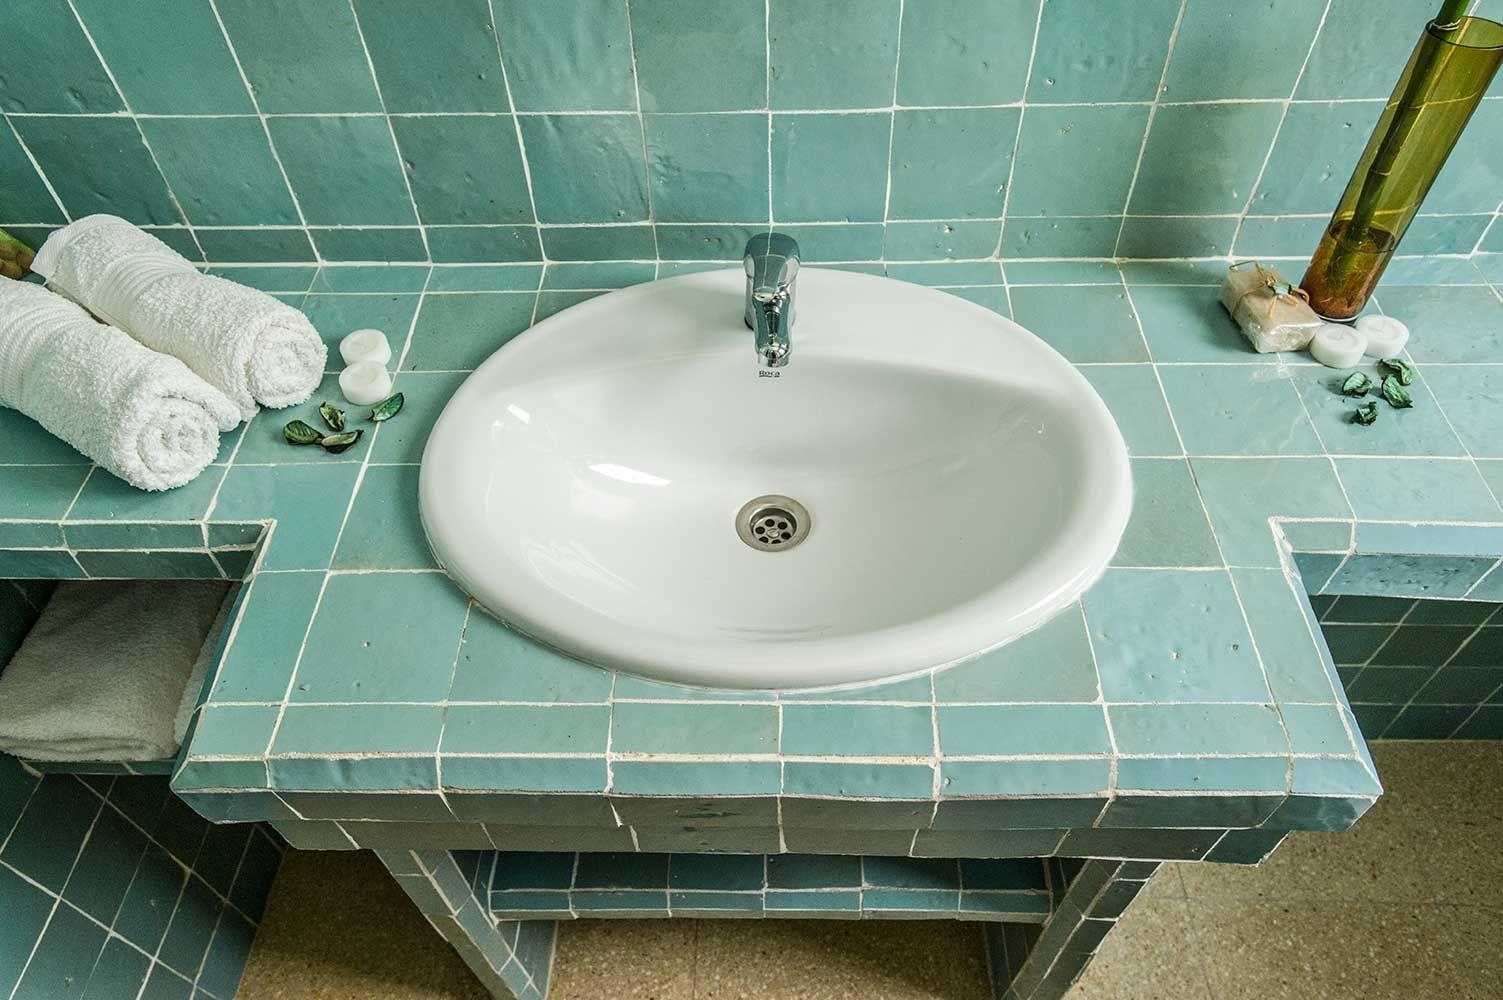 Salle De Bain Marocaine Zellige ~ zellige carrelage marocain mosaic del sur salle de bain